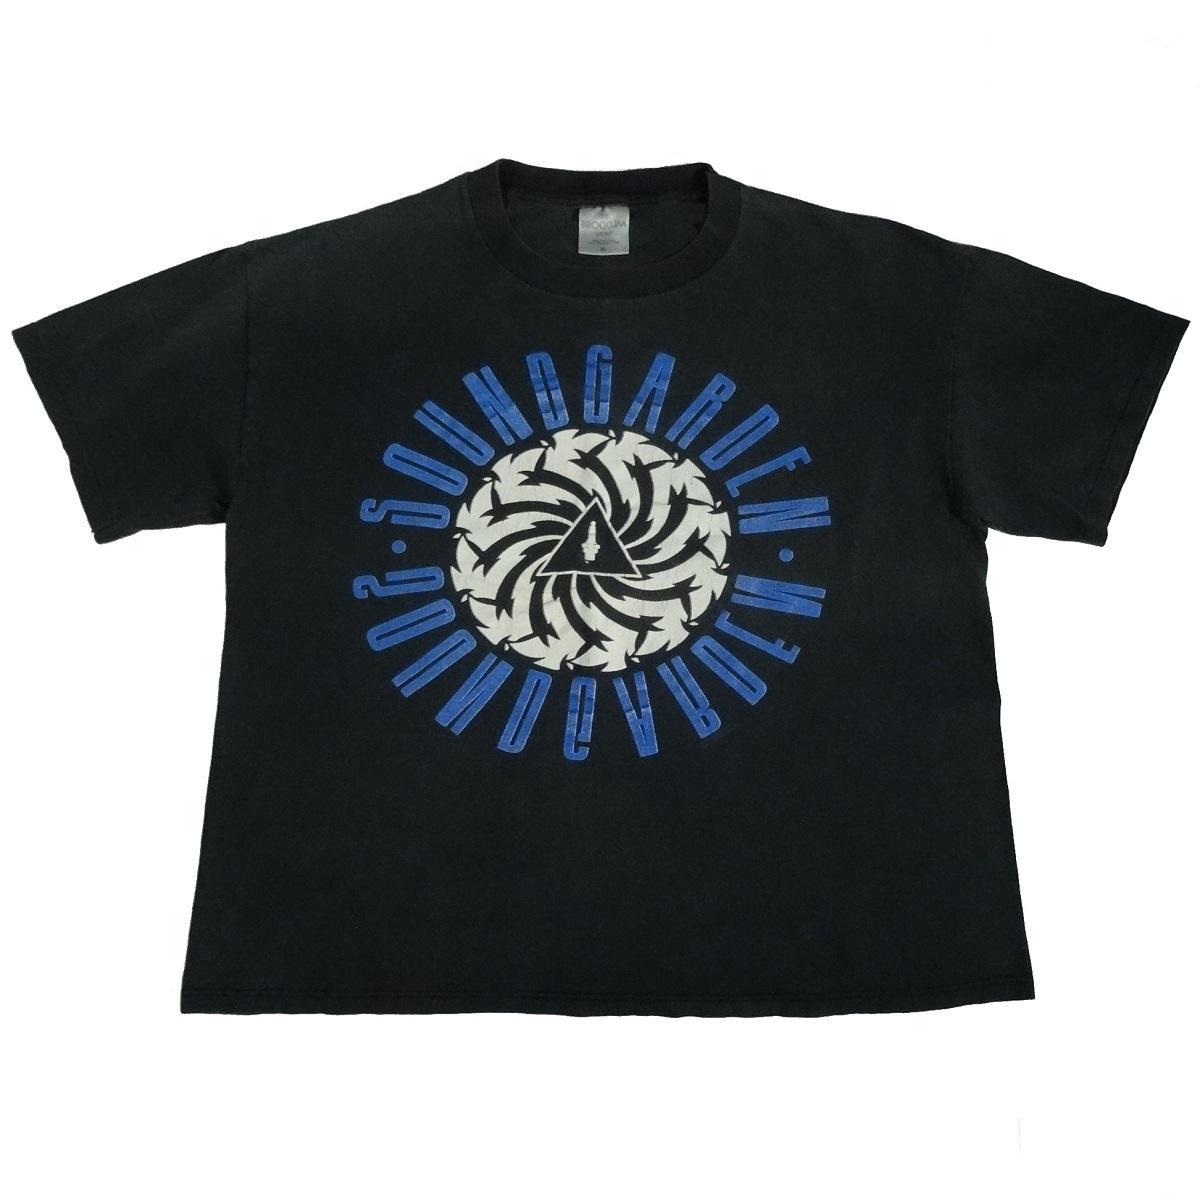 soundgarden badmotorfinger vintage 1992 somms t shirt front of shirt